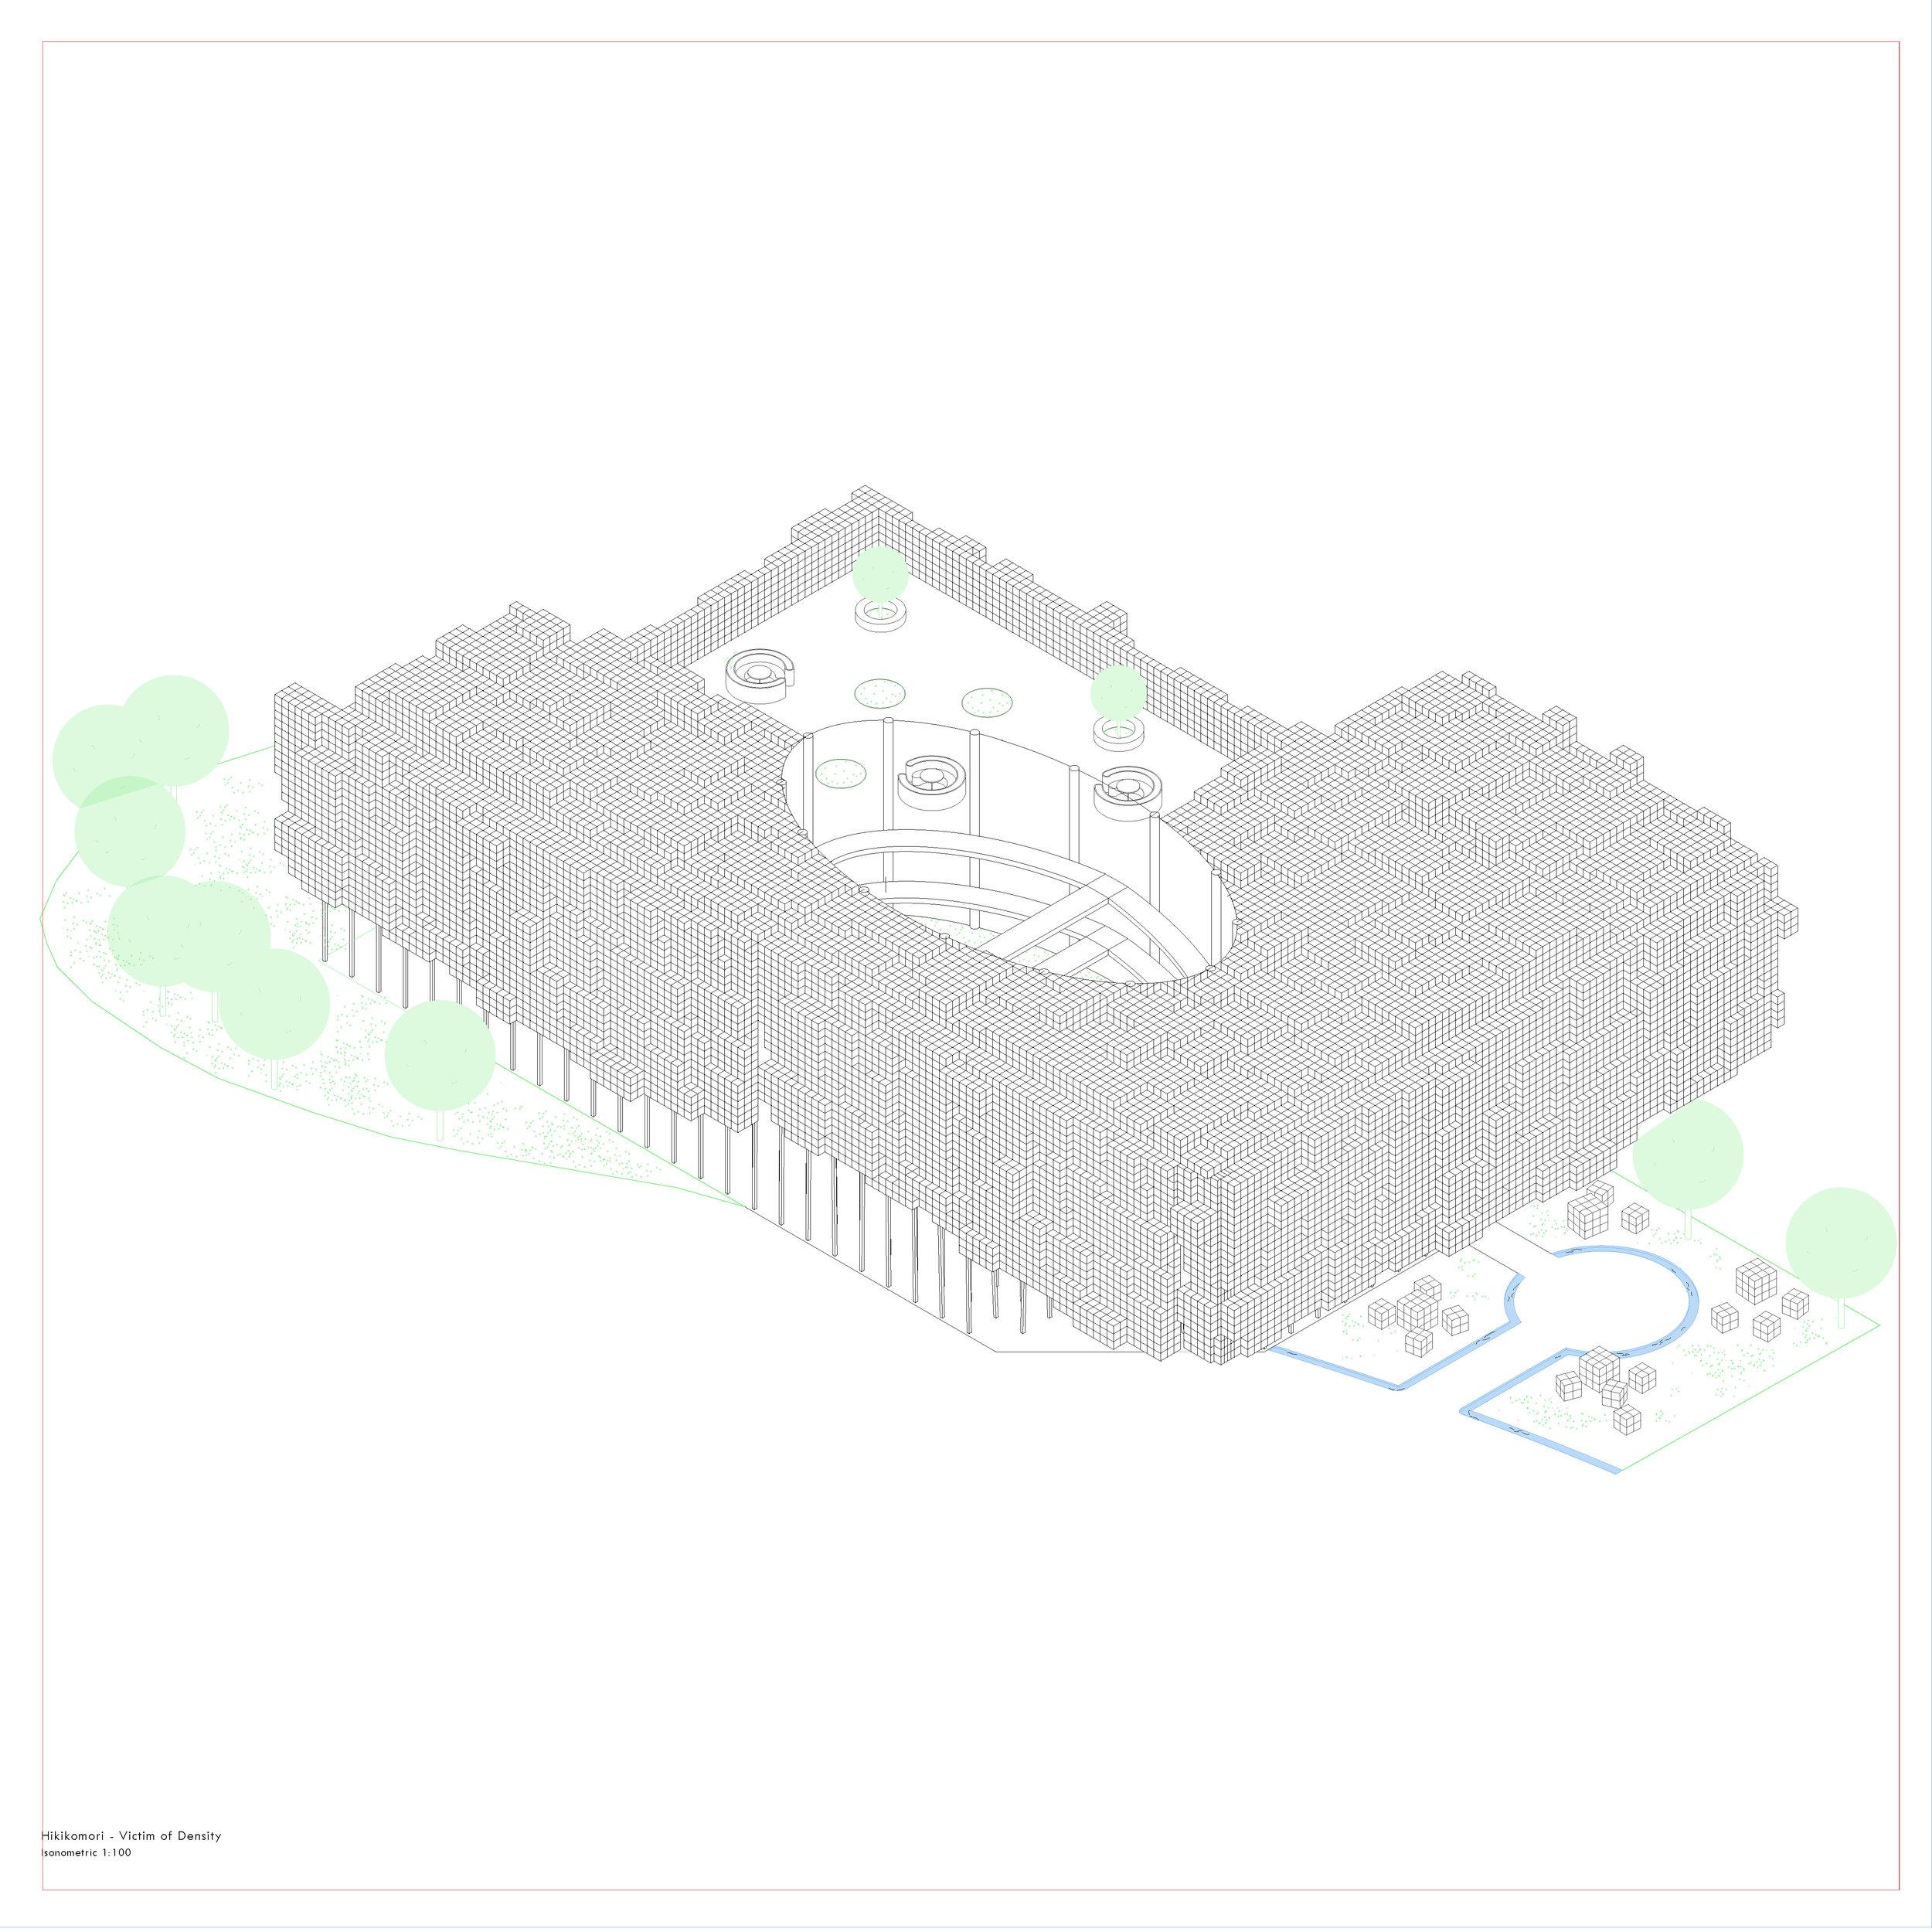 Shou-Hui Chen- Museum of Hikikomori - Victim of Density AXO.jpg